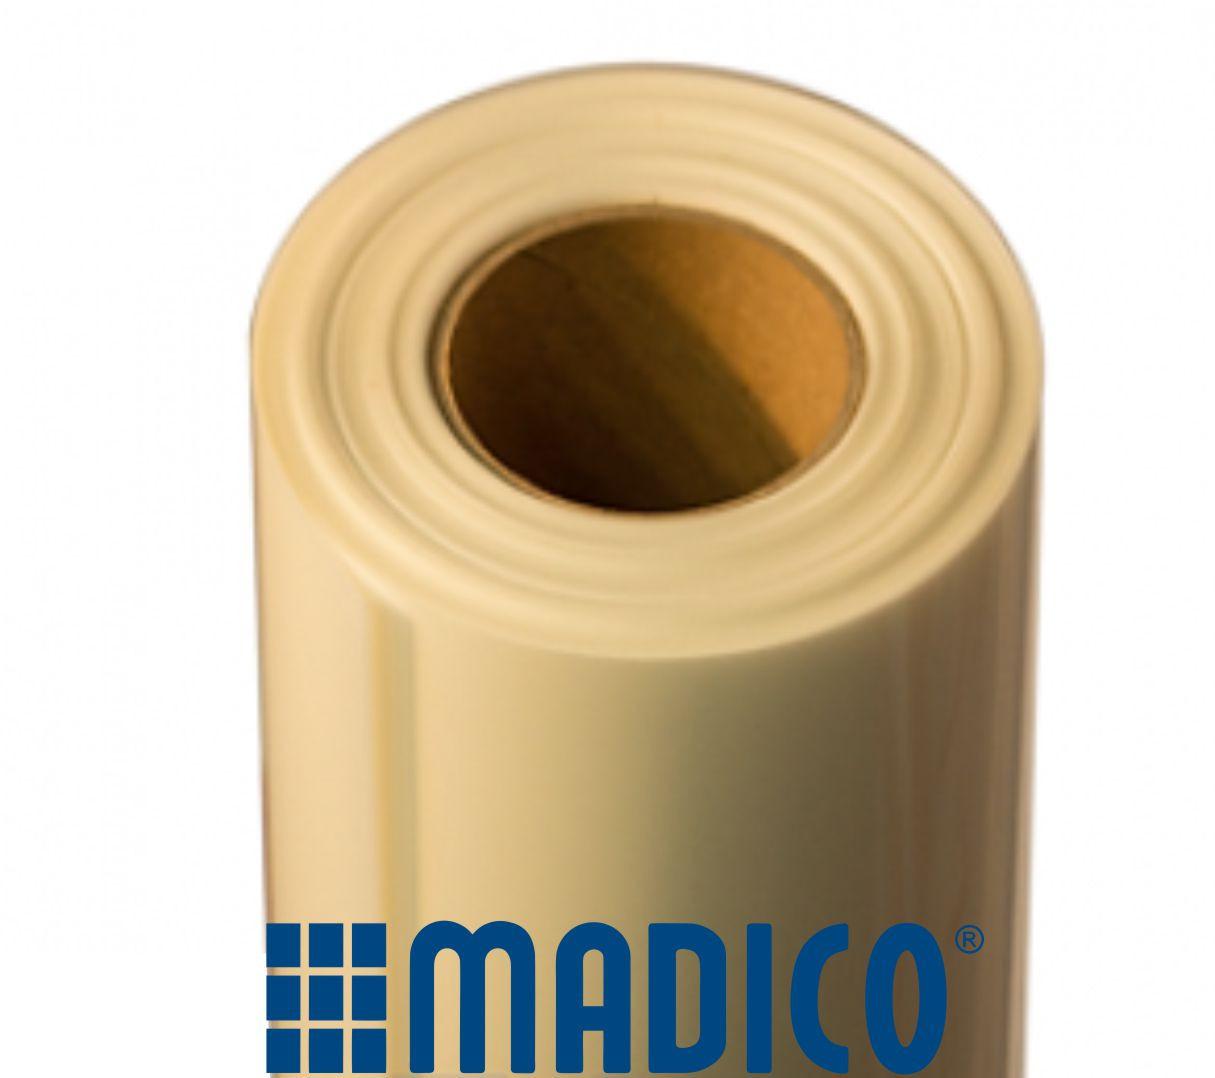 Антигравійна захисна плівка Madico Invisi-Film Tough Coat (США) 0,61 м